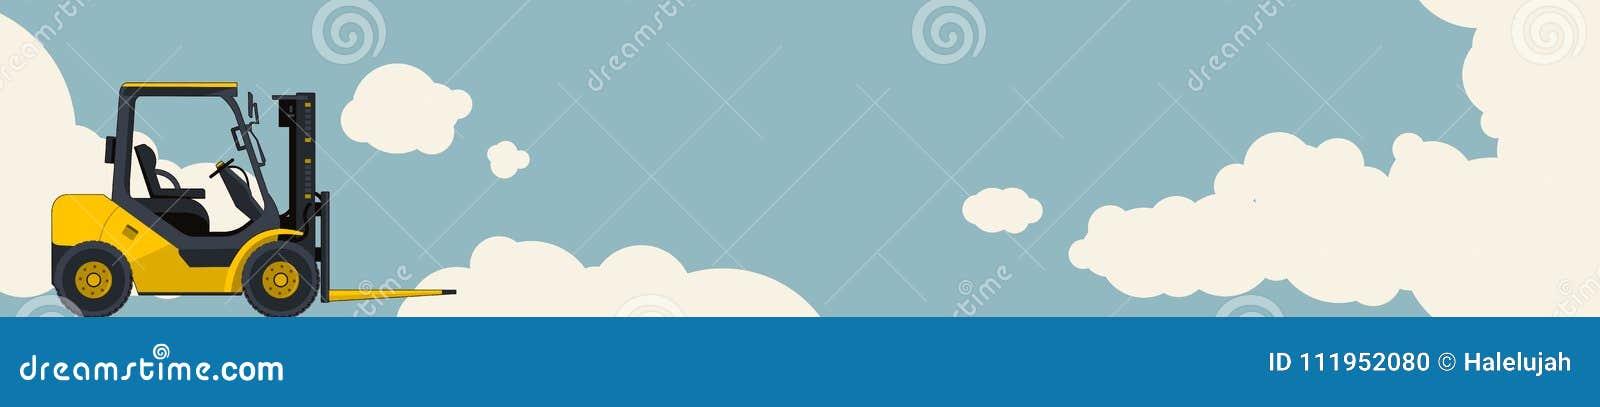 Gele vorkheftrucklader, hemel met wolken op achtergrond Horizontale bannerlay-out met klein graafwerktuig, kraan